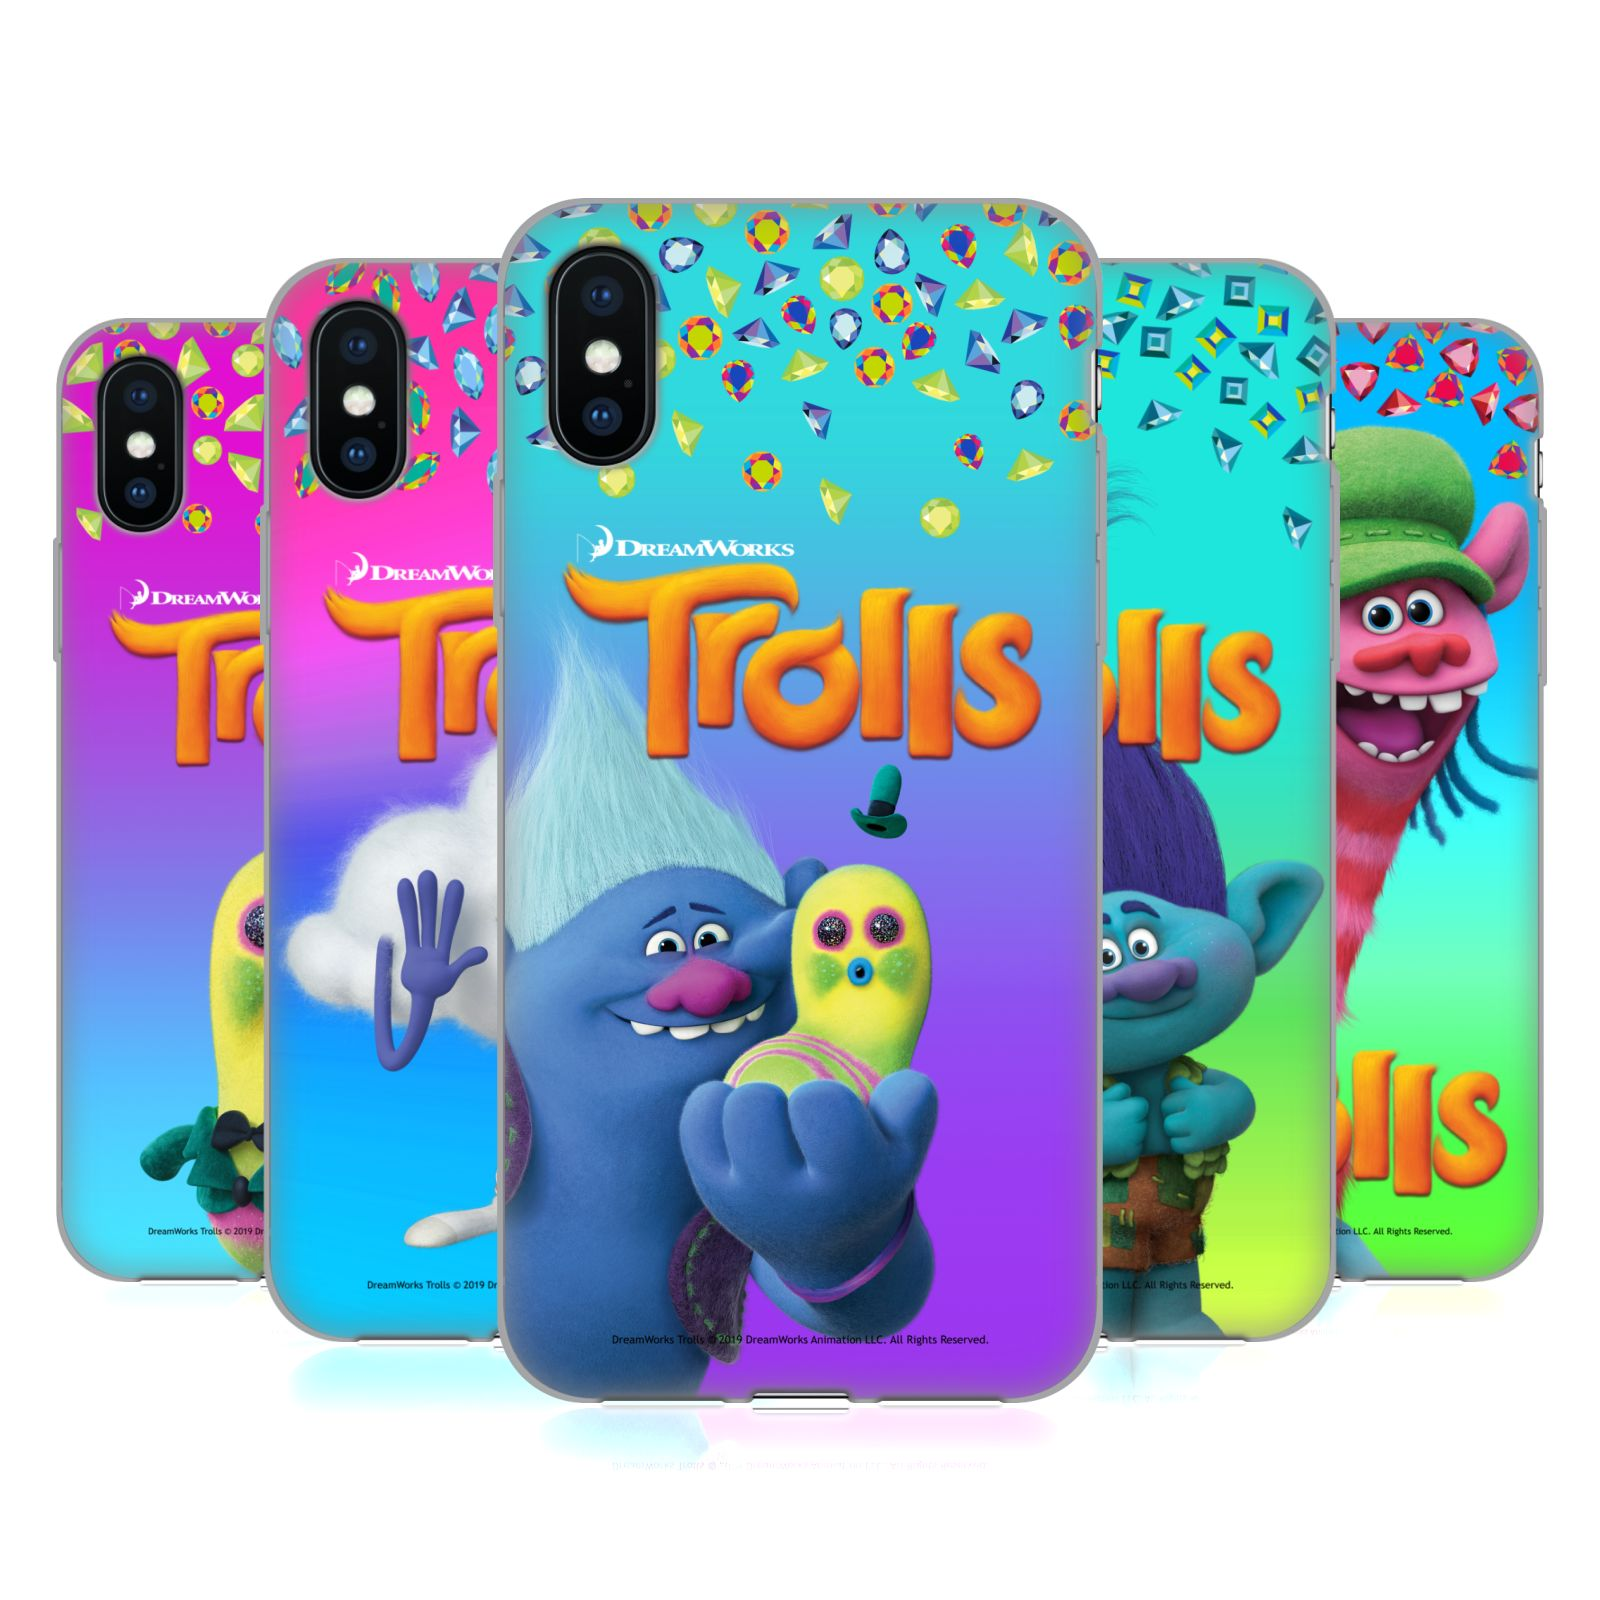 Trolls <!--translate-lineup-->Snack Pack<!--translate-lineup-->